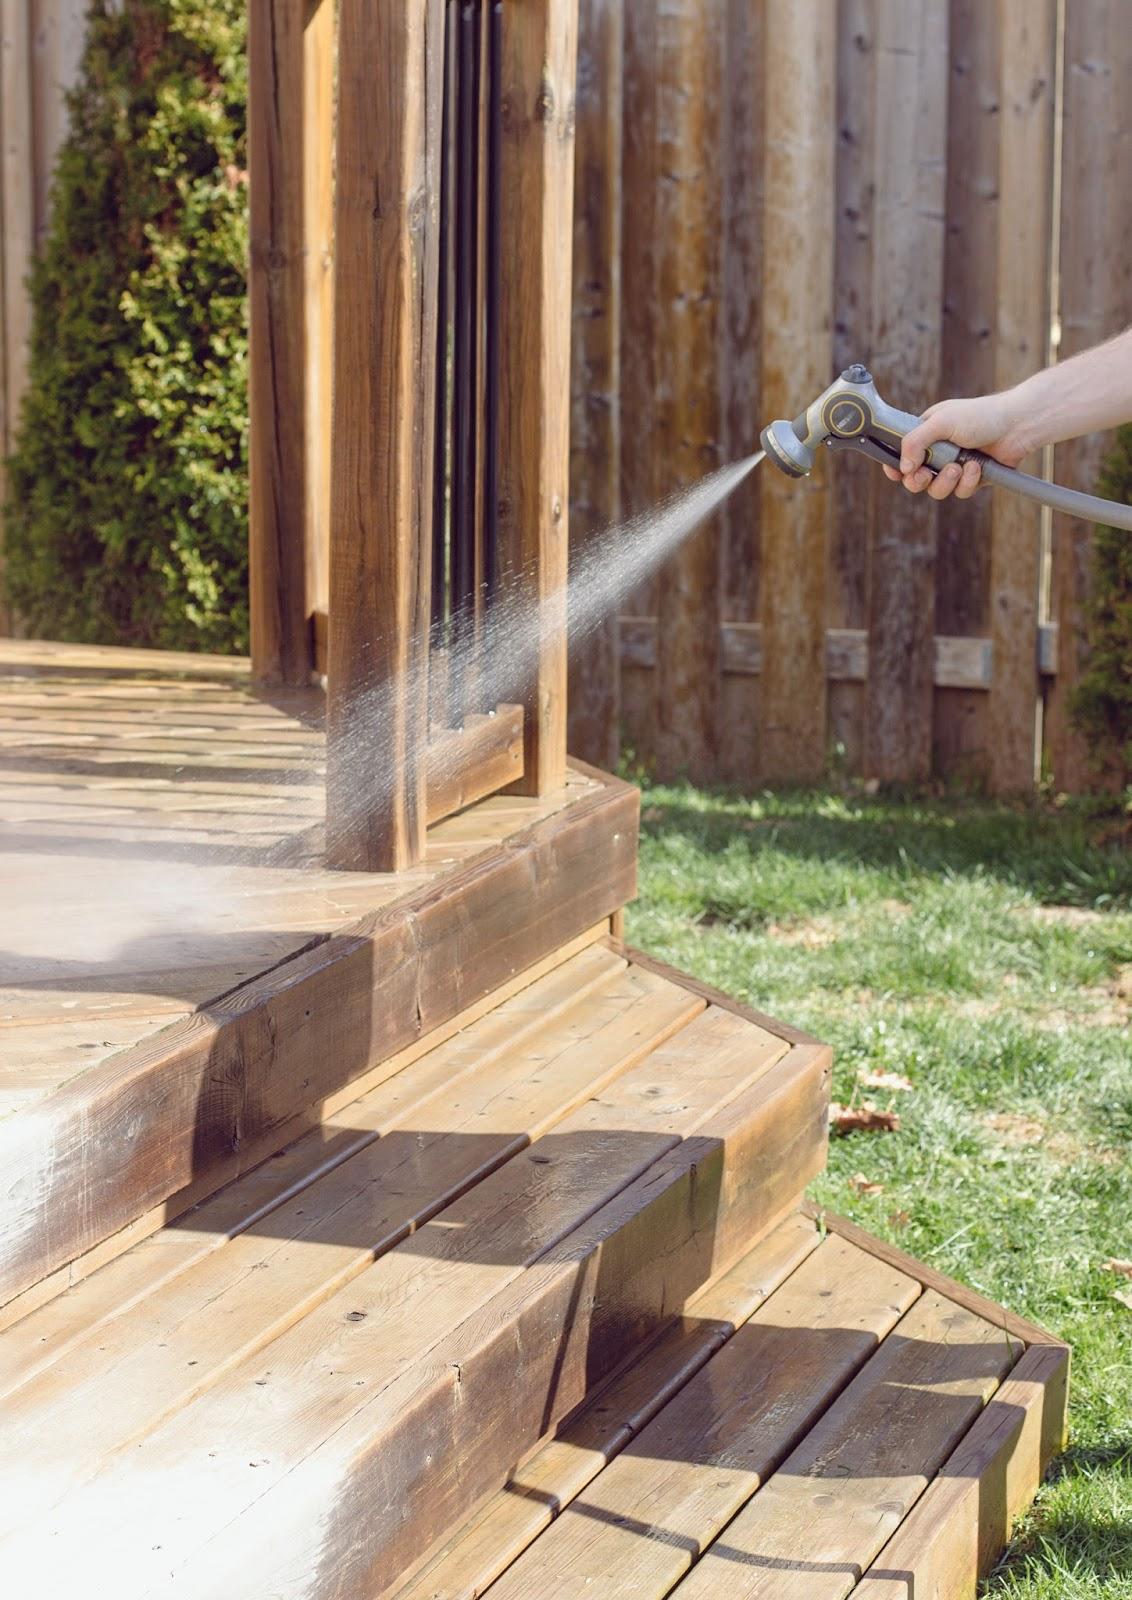 Spray-Deck-Prep-for-Cleaner